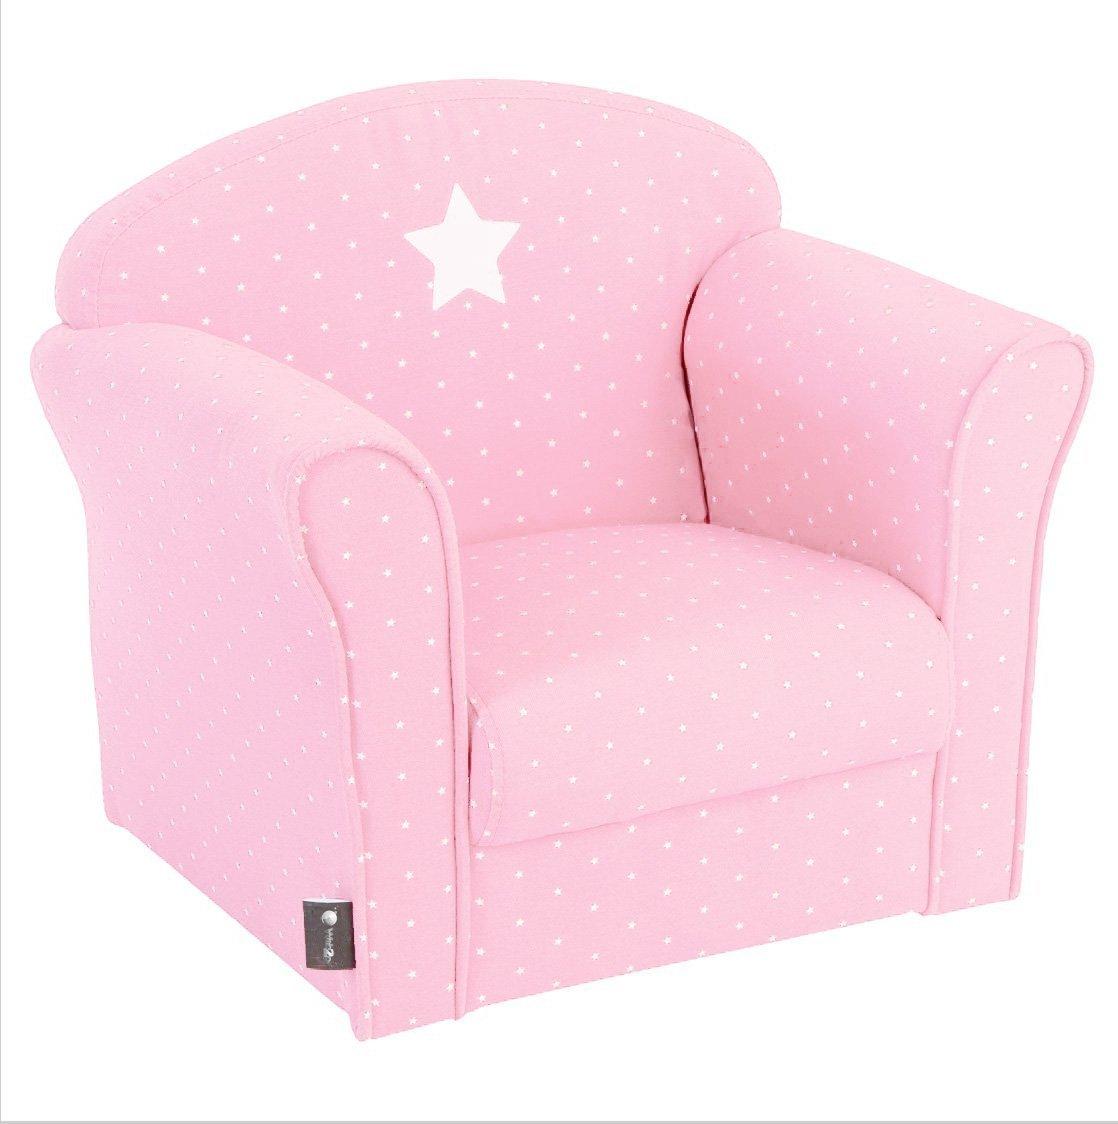 Silla para niños, color rosa claro WEB2O